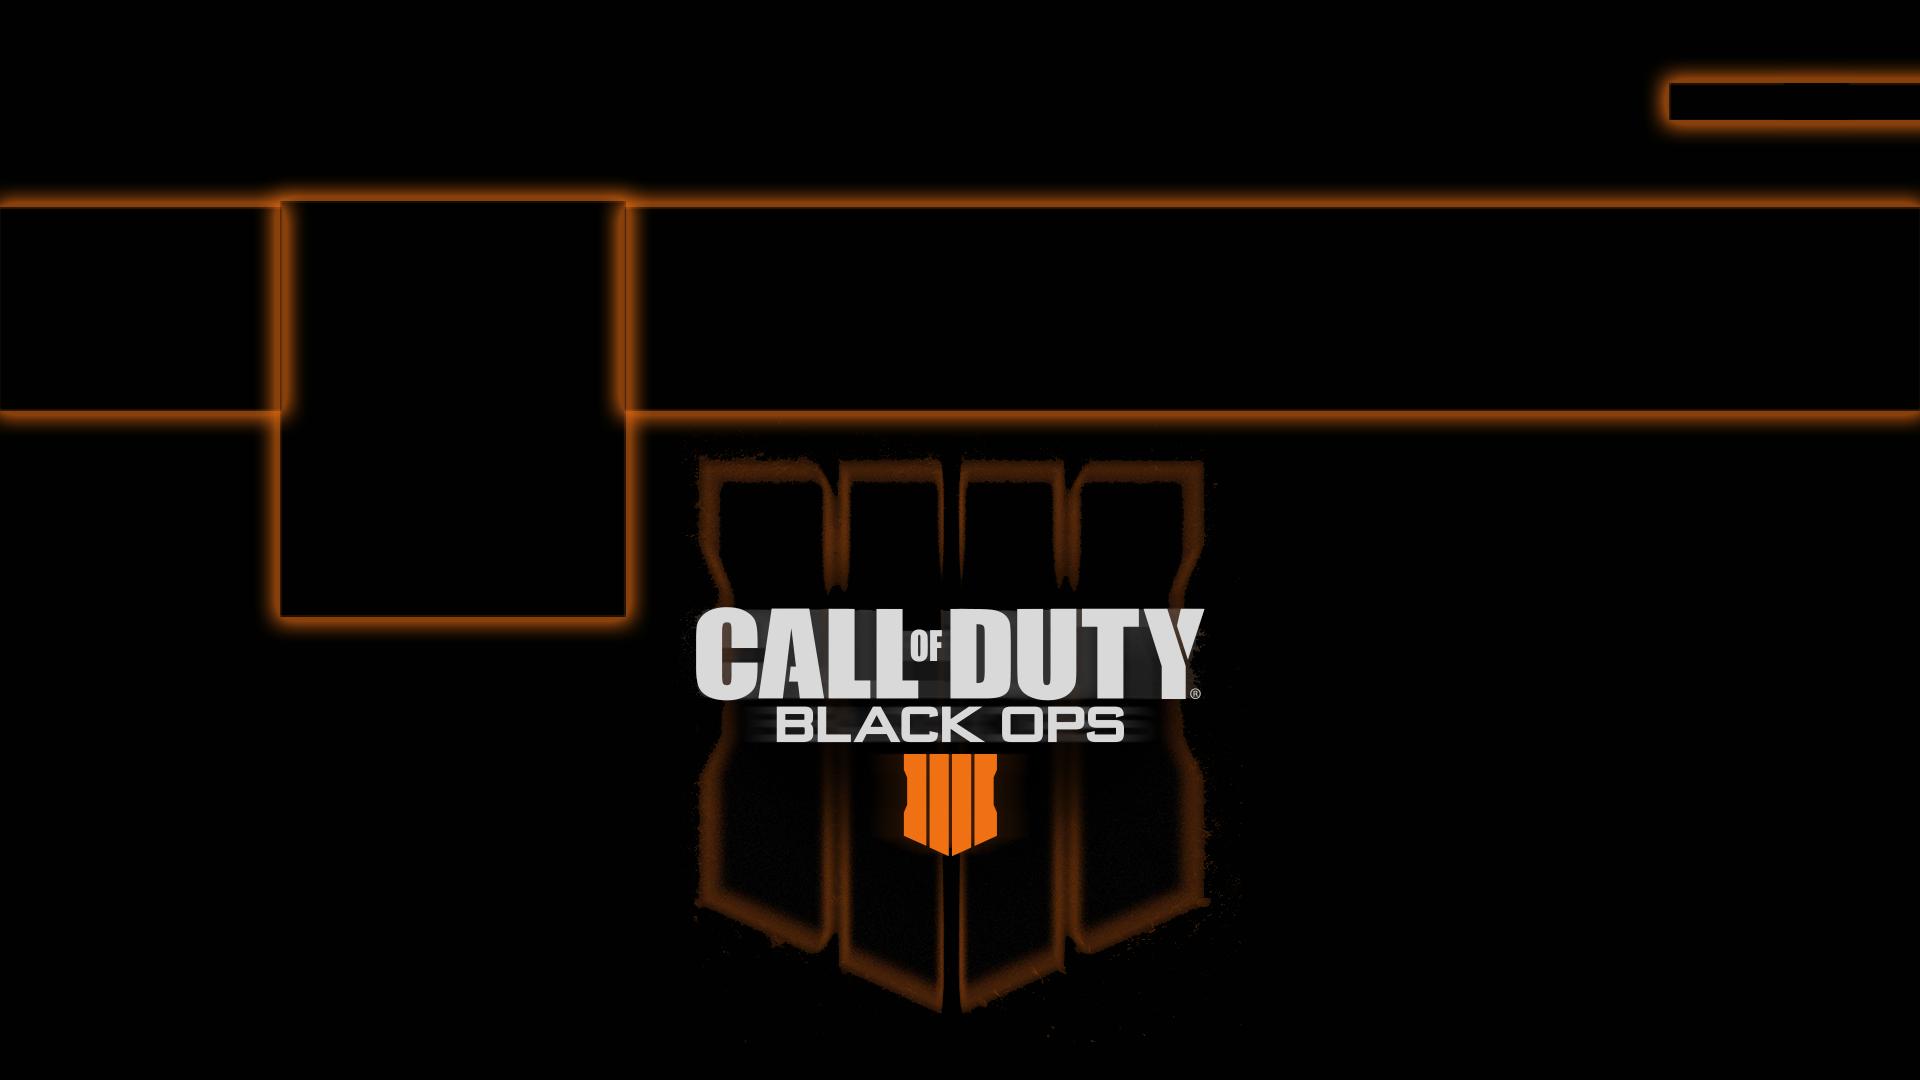 Call Of Duty Black Ops 4 4k Wallpaper Call Of Duty Black Black